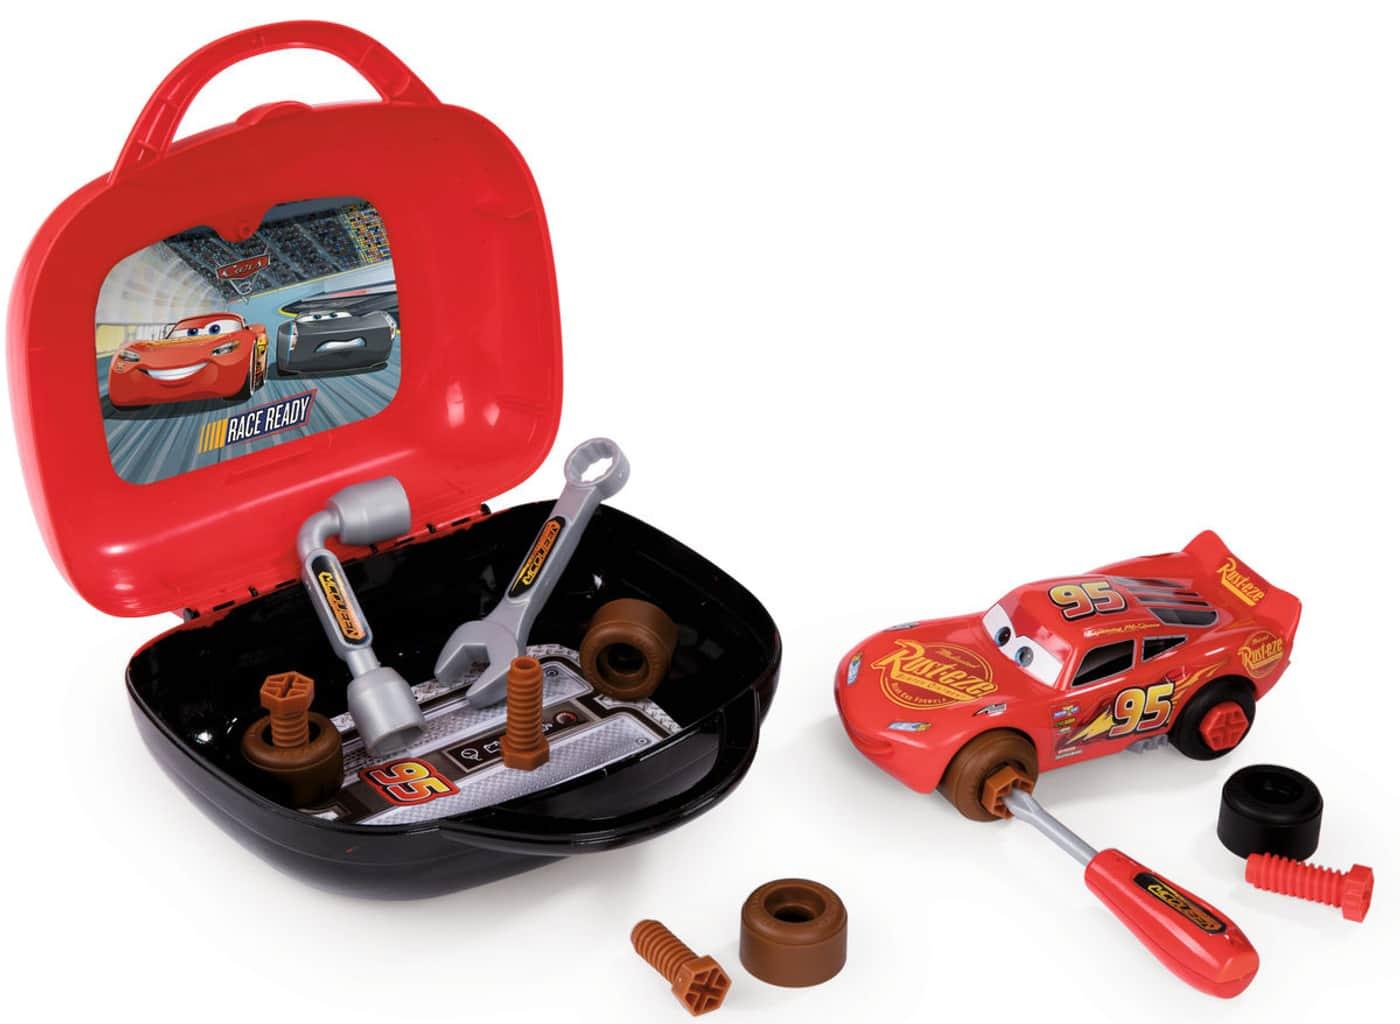 malette cars